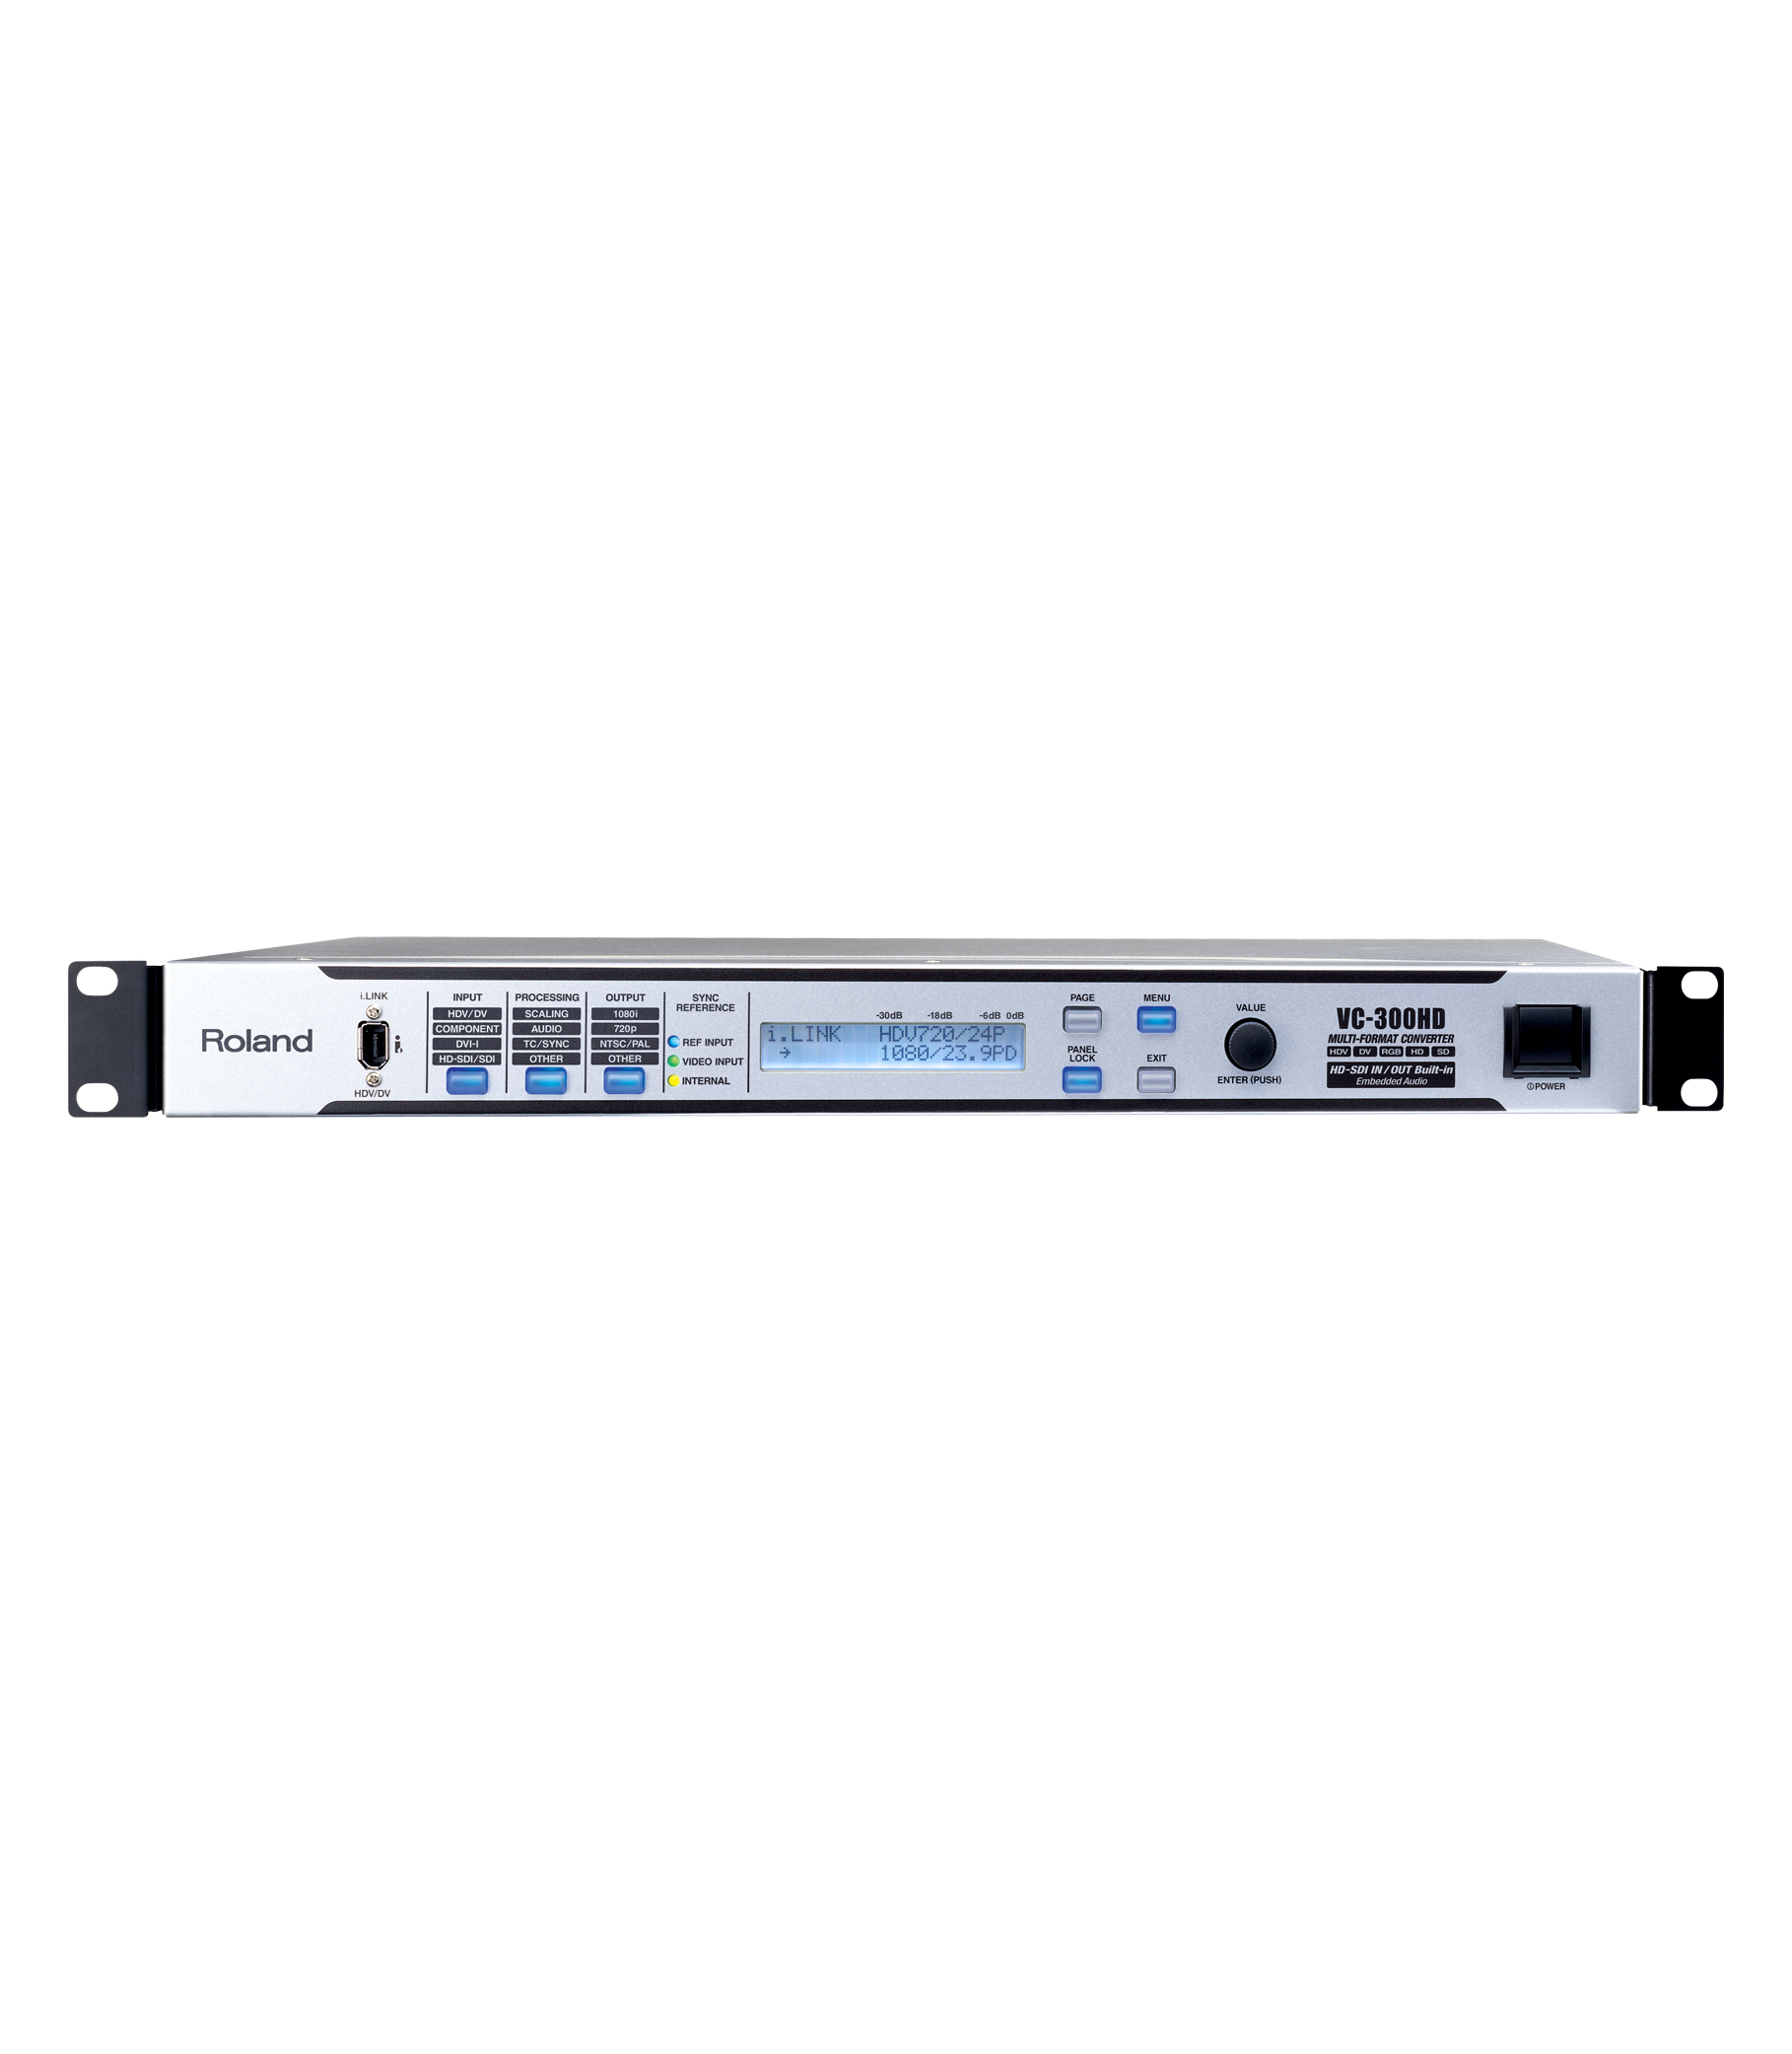 VC 300HD Multi Format Video Converter